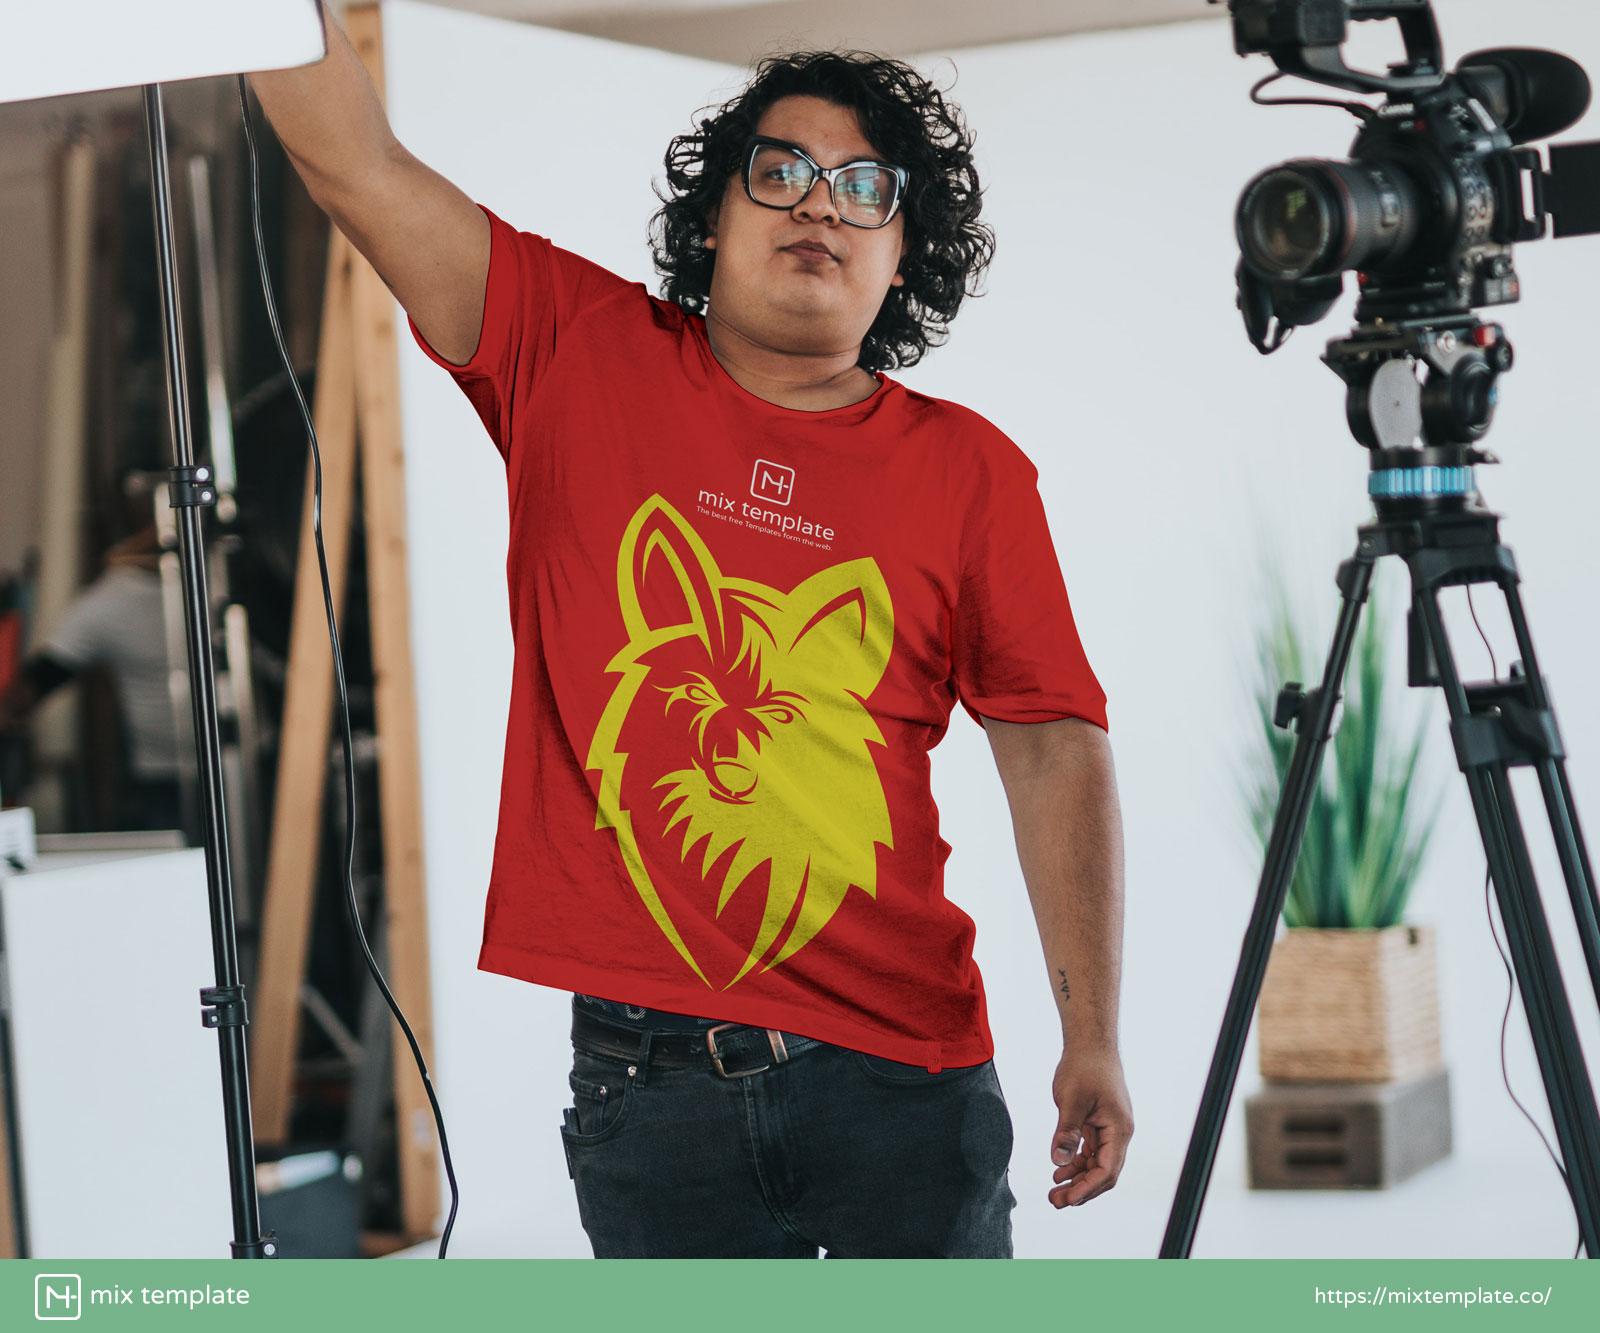 Free-Camera-Man-White-T-Shirt-Mockup-Template-38